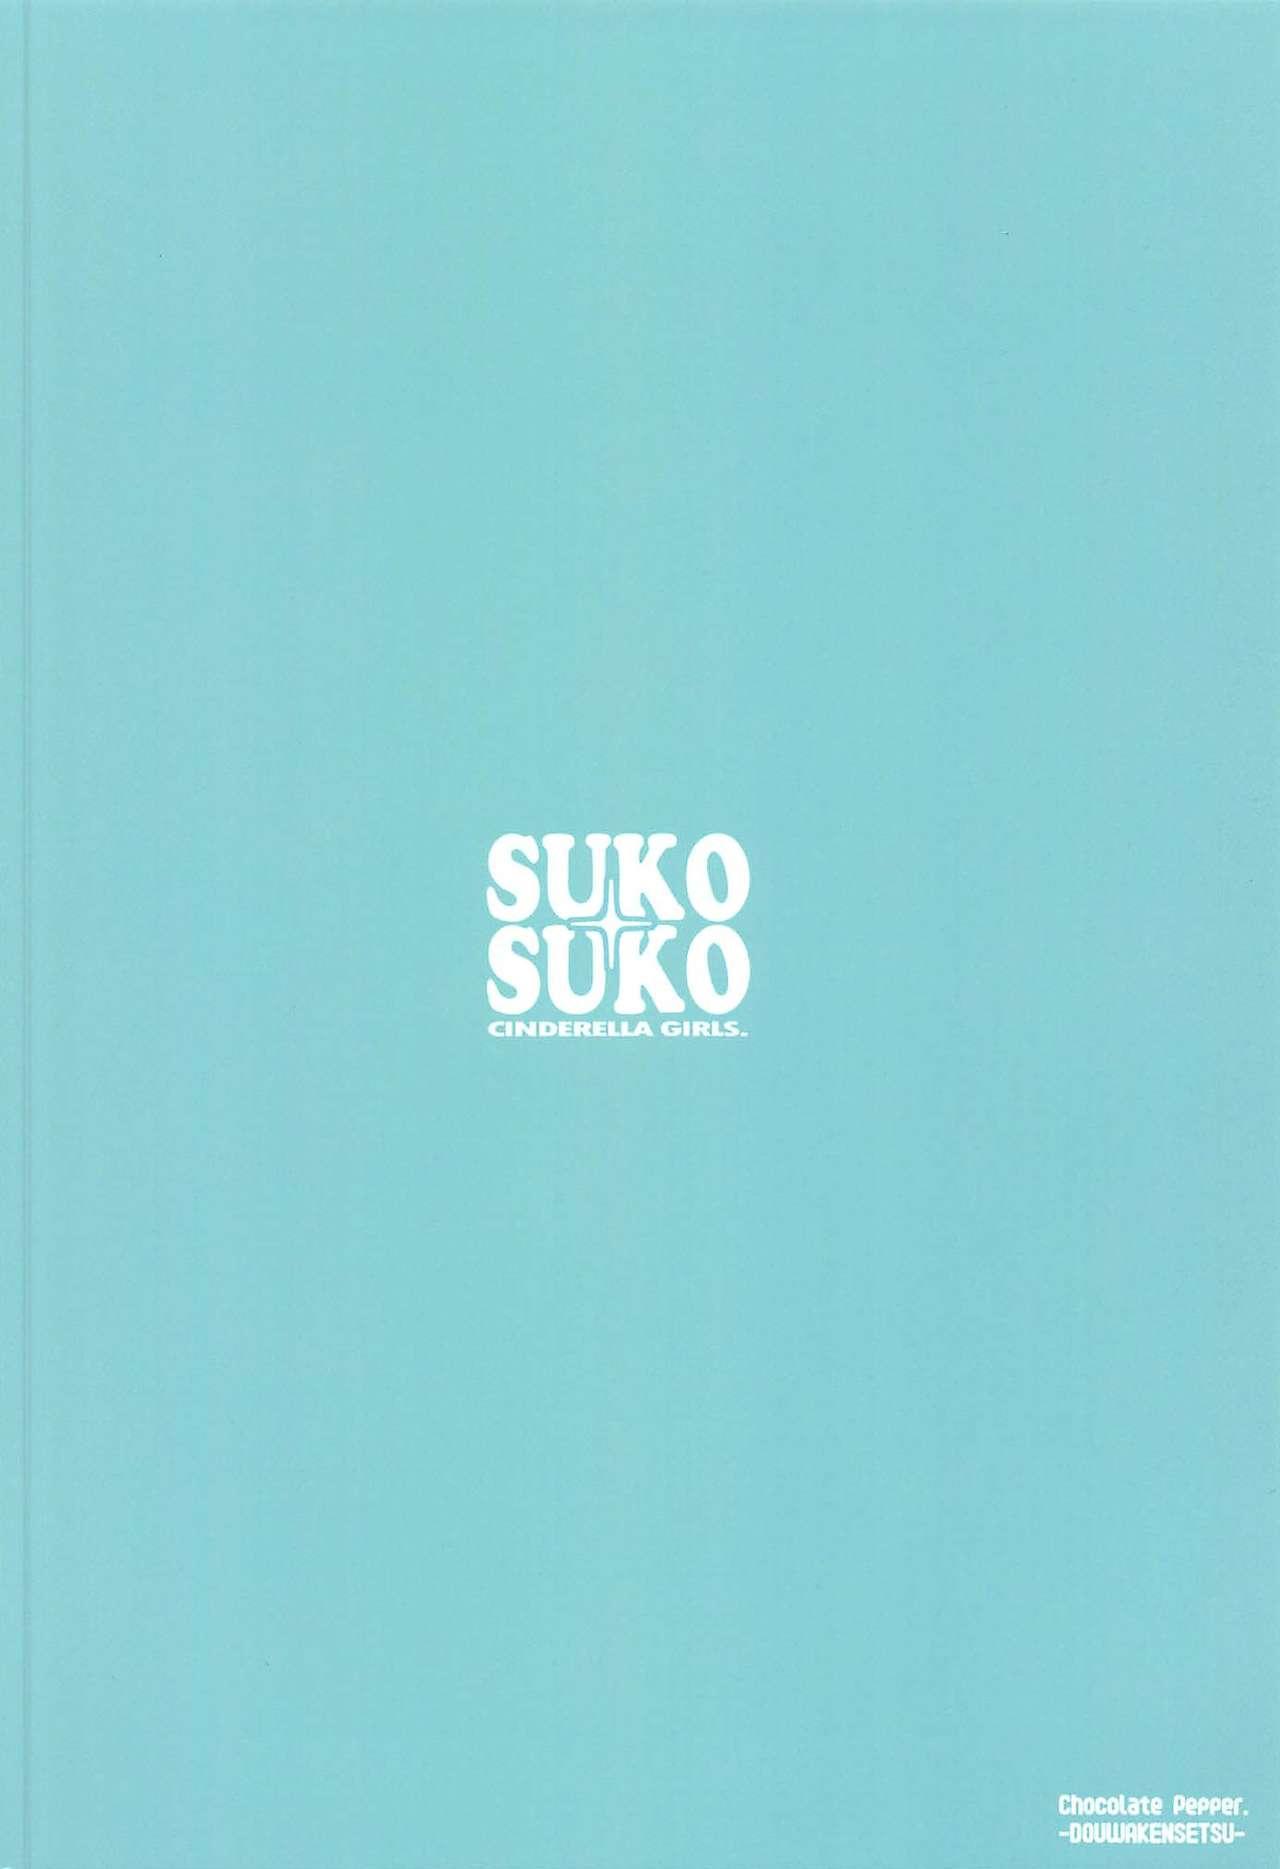 SUKO + SUKO 26